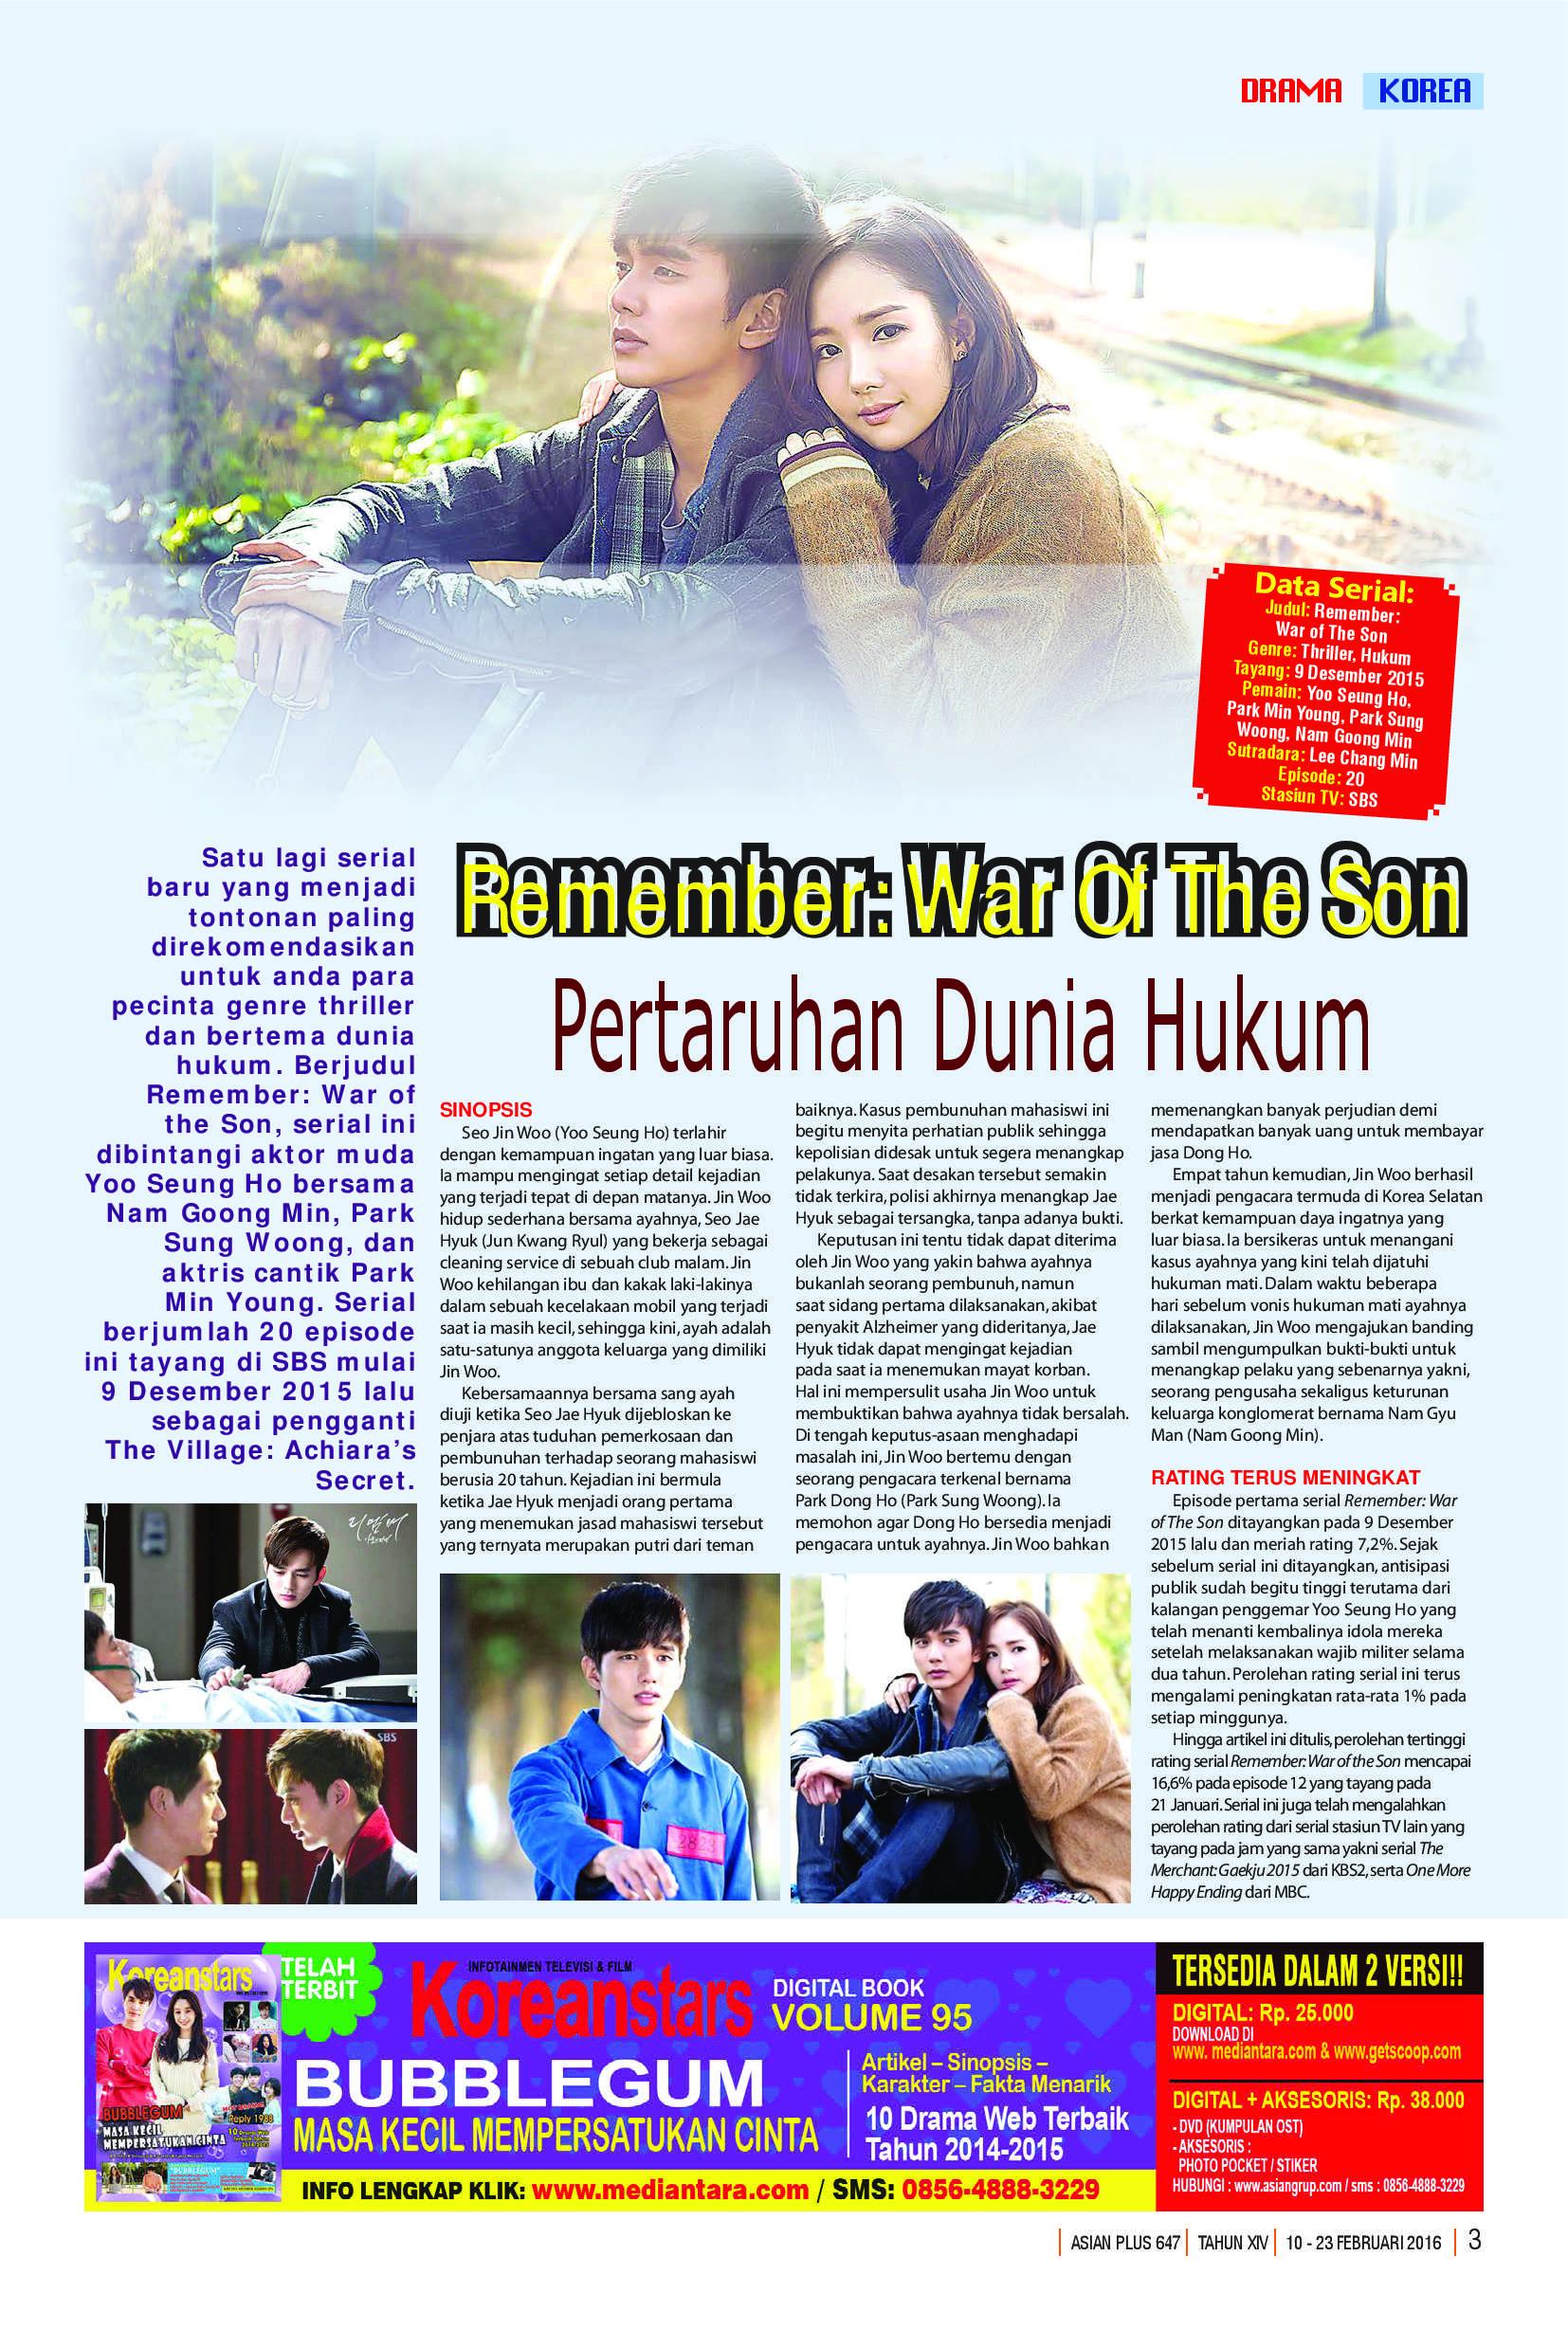 Asianplus Magazine Ed 647 February 2016 Gramedia Digital